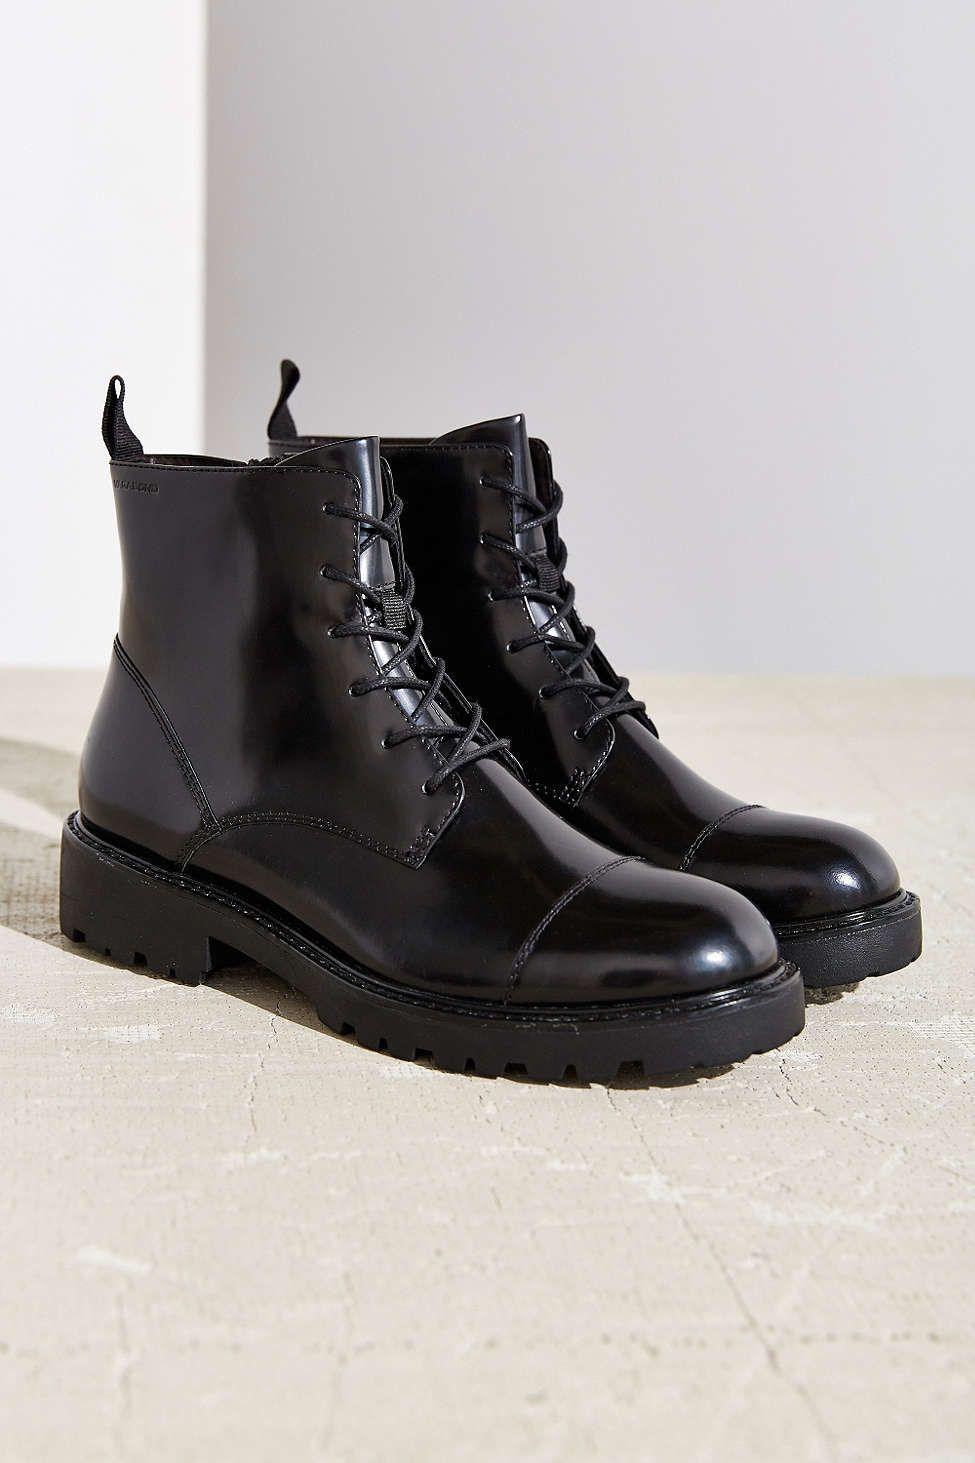 d7bd53d3807 Vagabond Kenova Combat Boot #UrbanOutfitters | Urban Outfitters ...